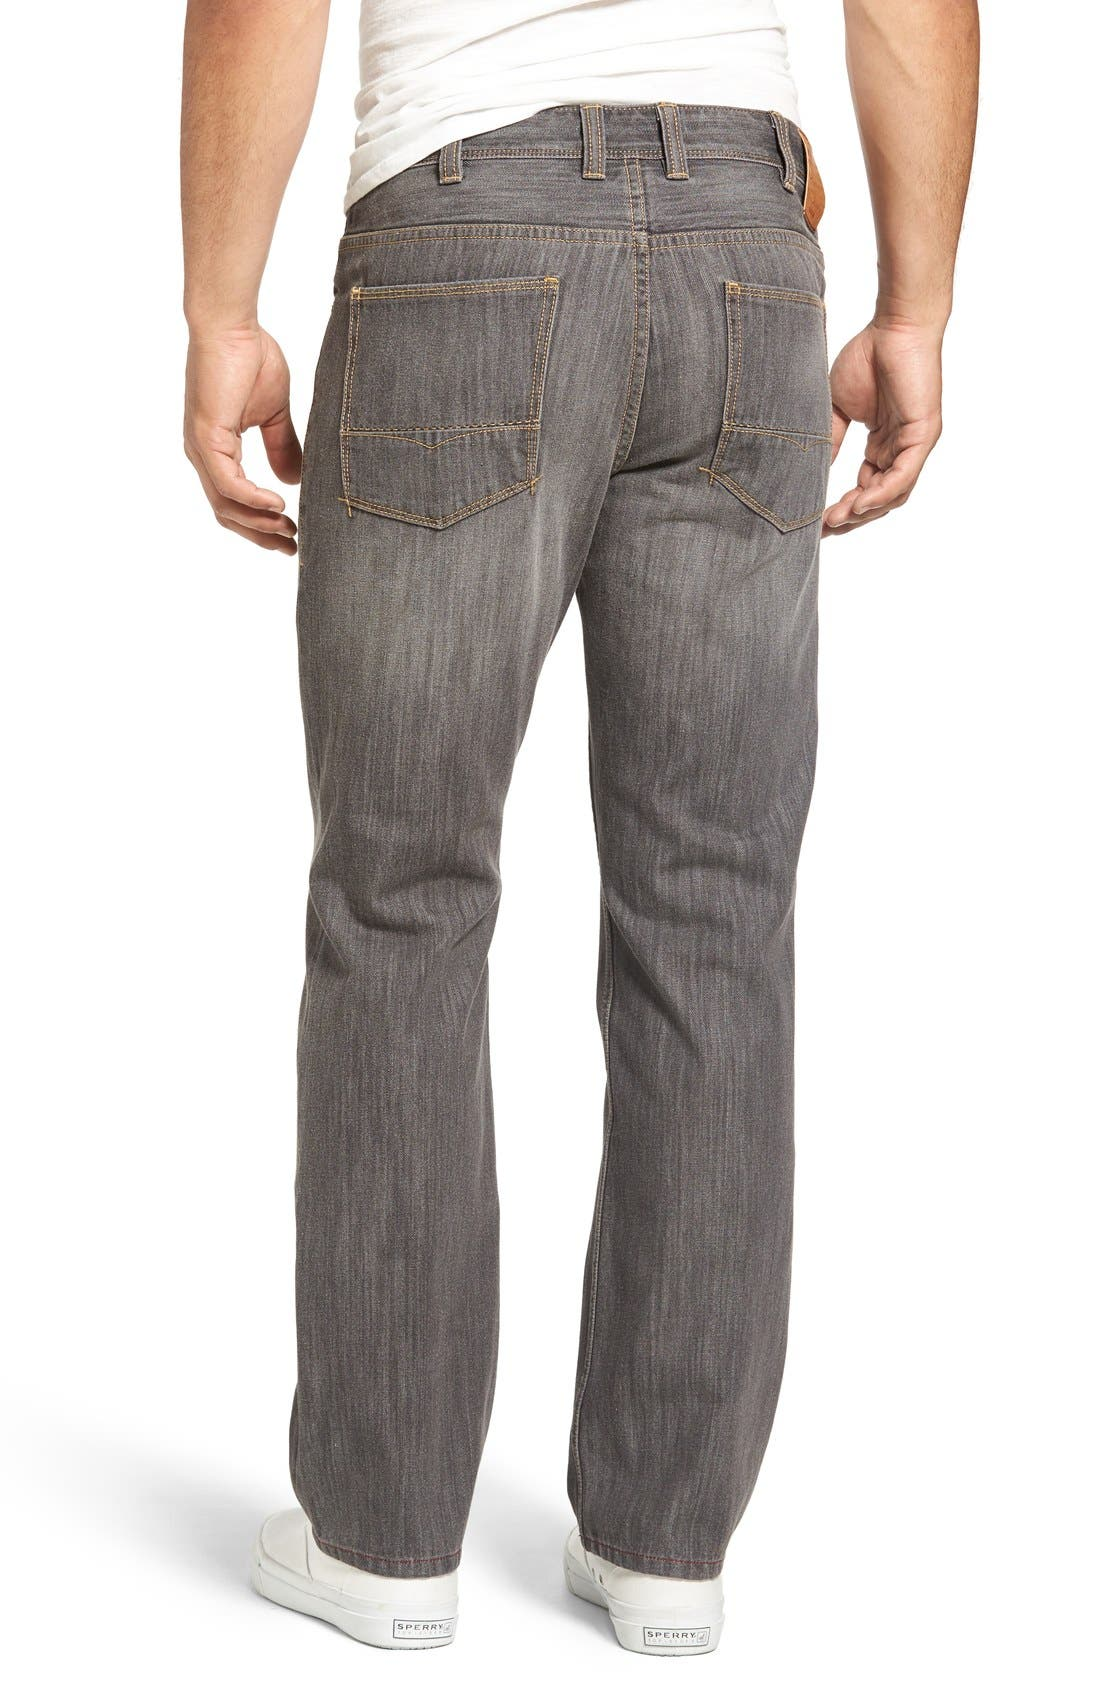 Barbados Bootcut Jeans,                         Main,                         color, 050